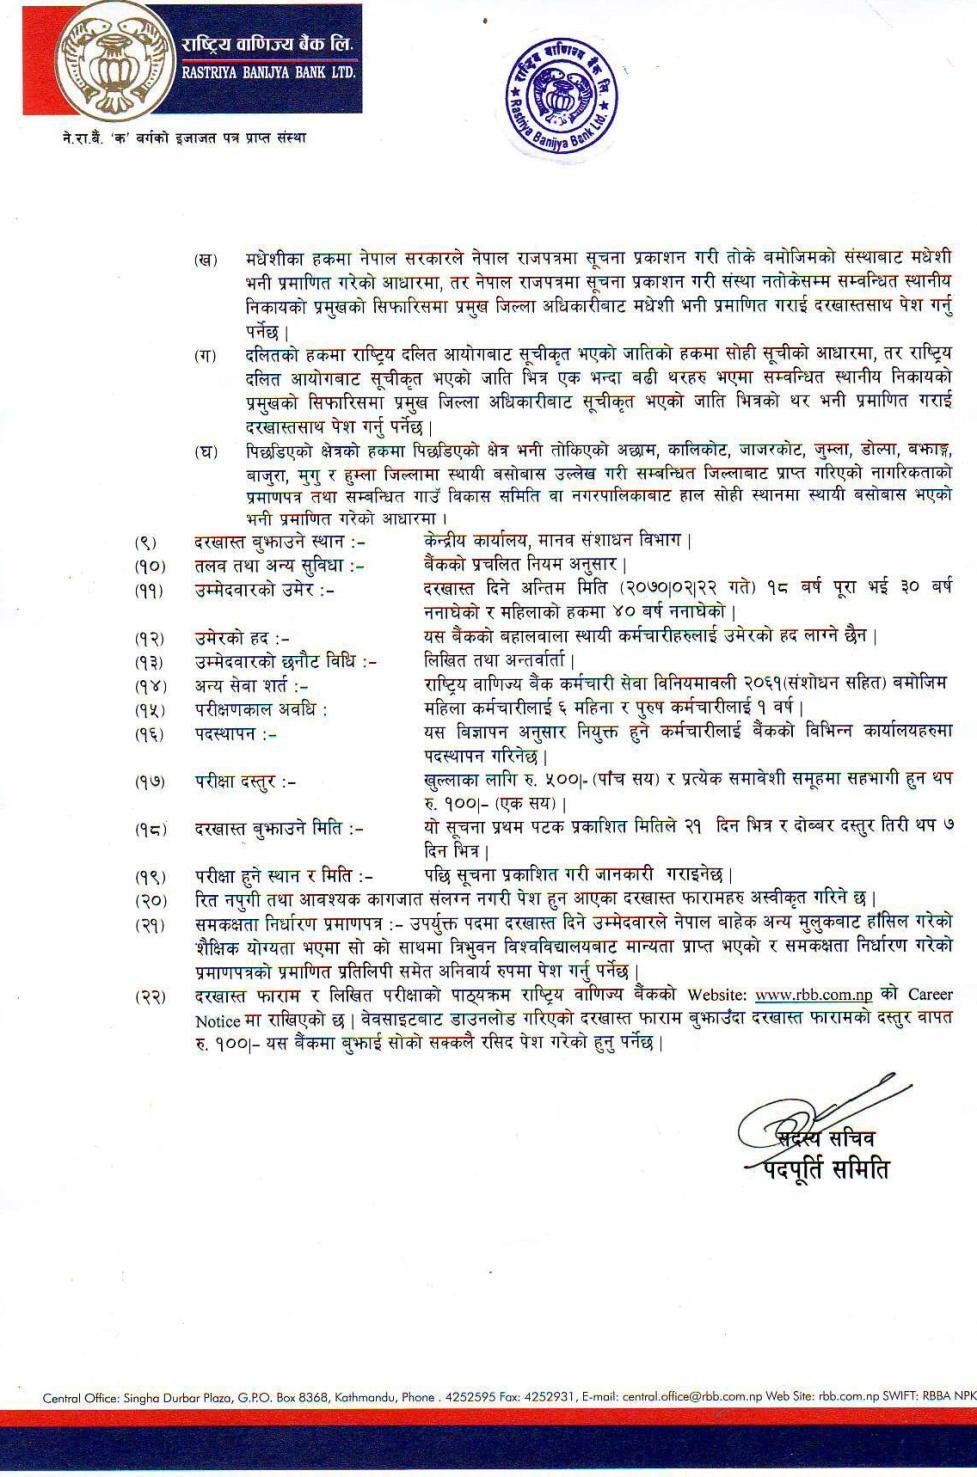 nepal banijya bank form